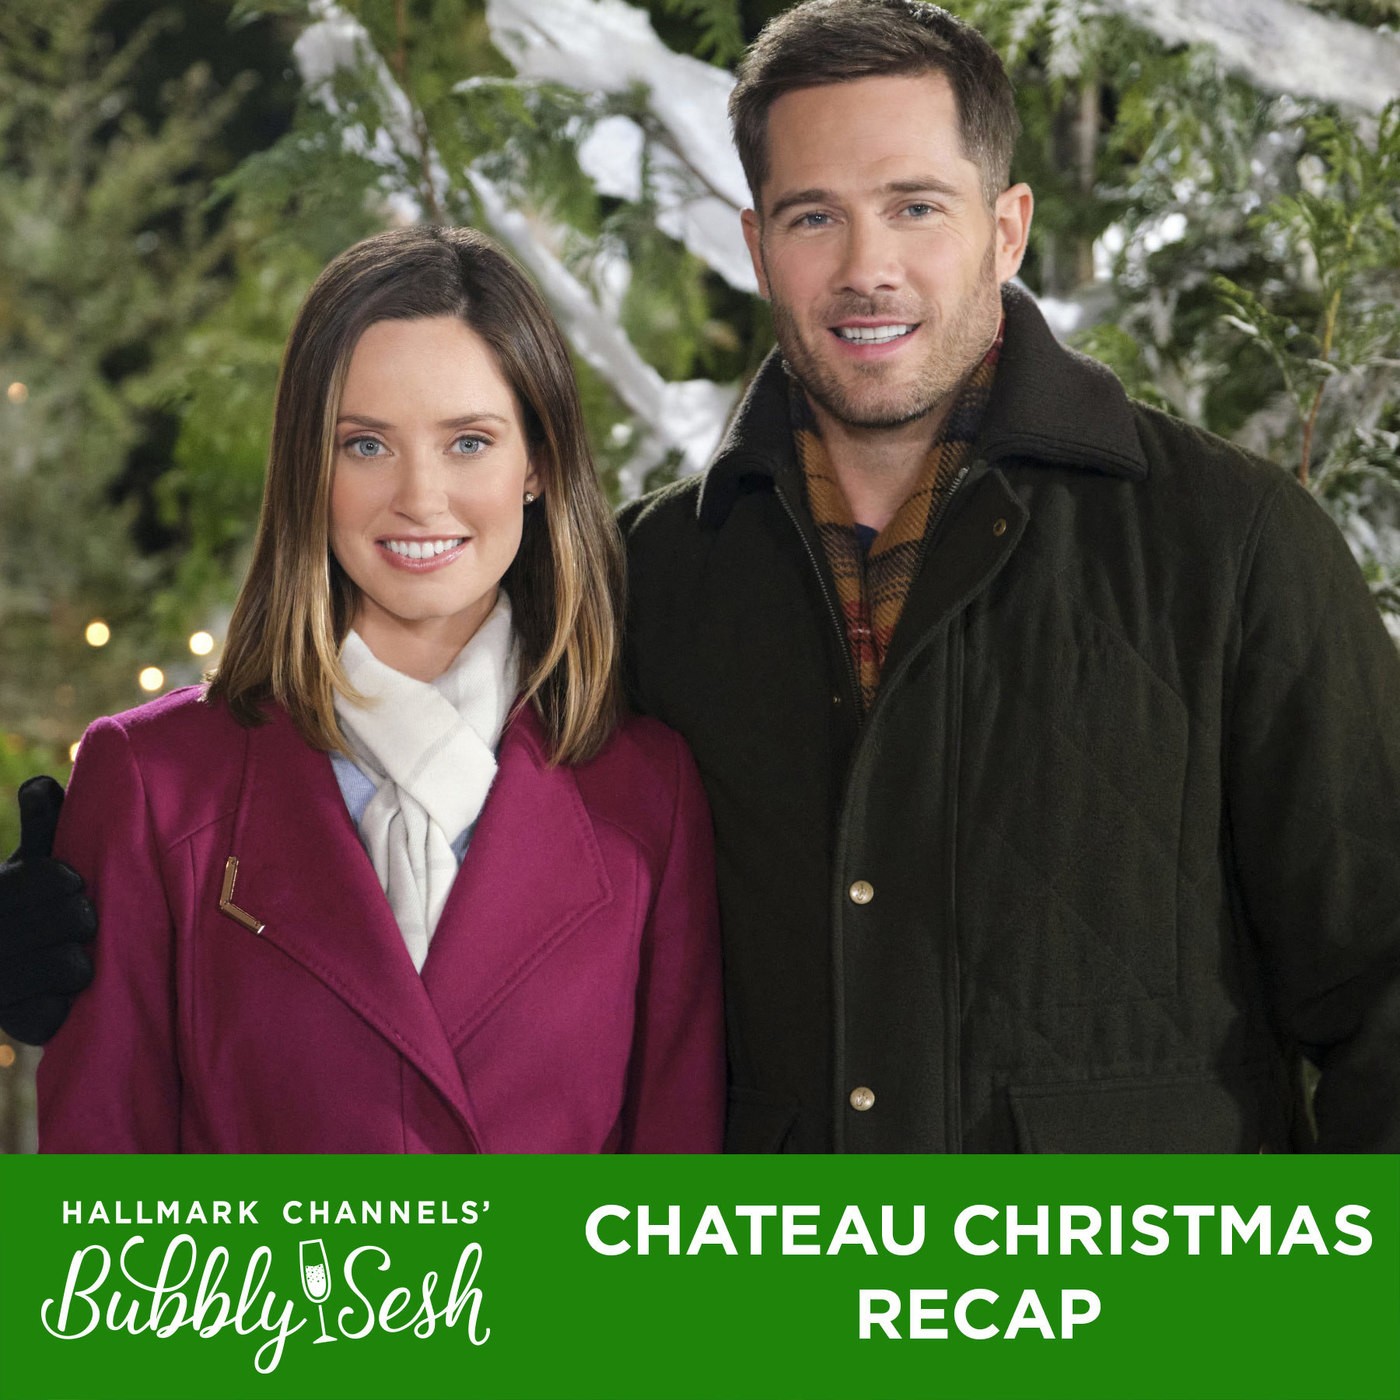 Chateau Christmas Recap